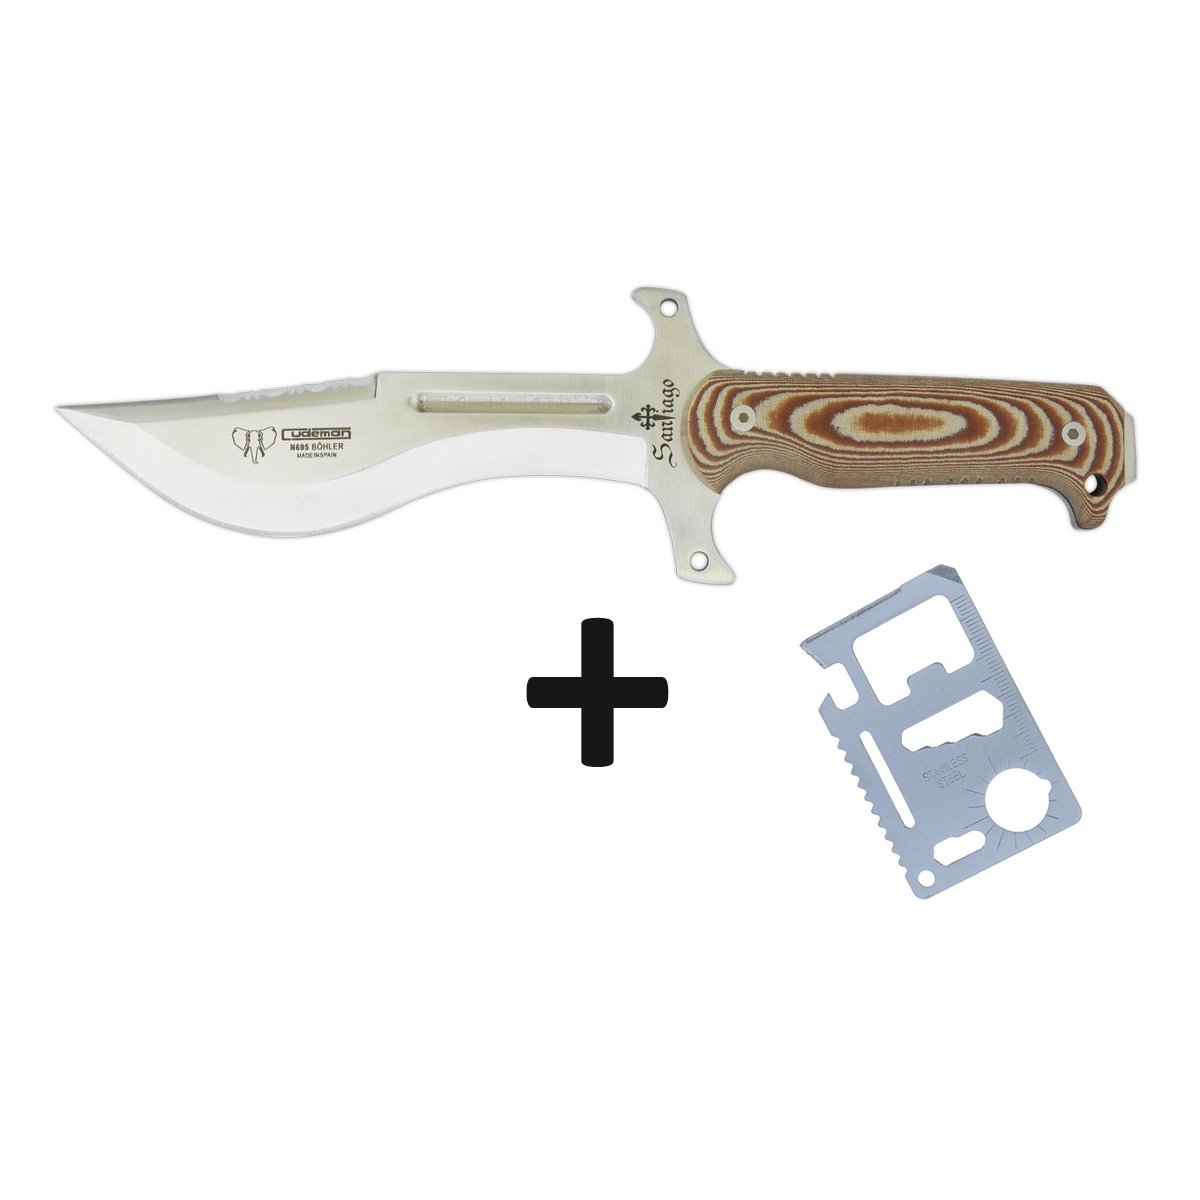 Survival Fixed blade knife Cudeman 145-X Mod Santiago with Micarta handle brown/ 29.7 cm total length Black